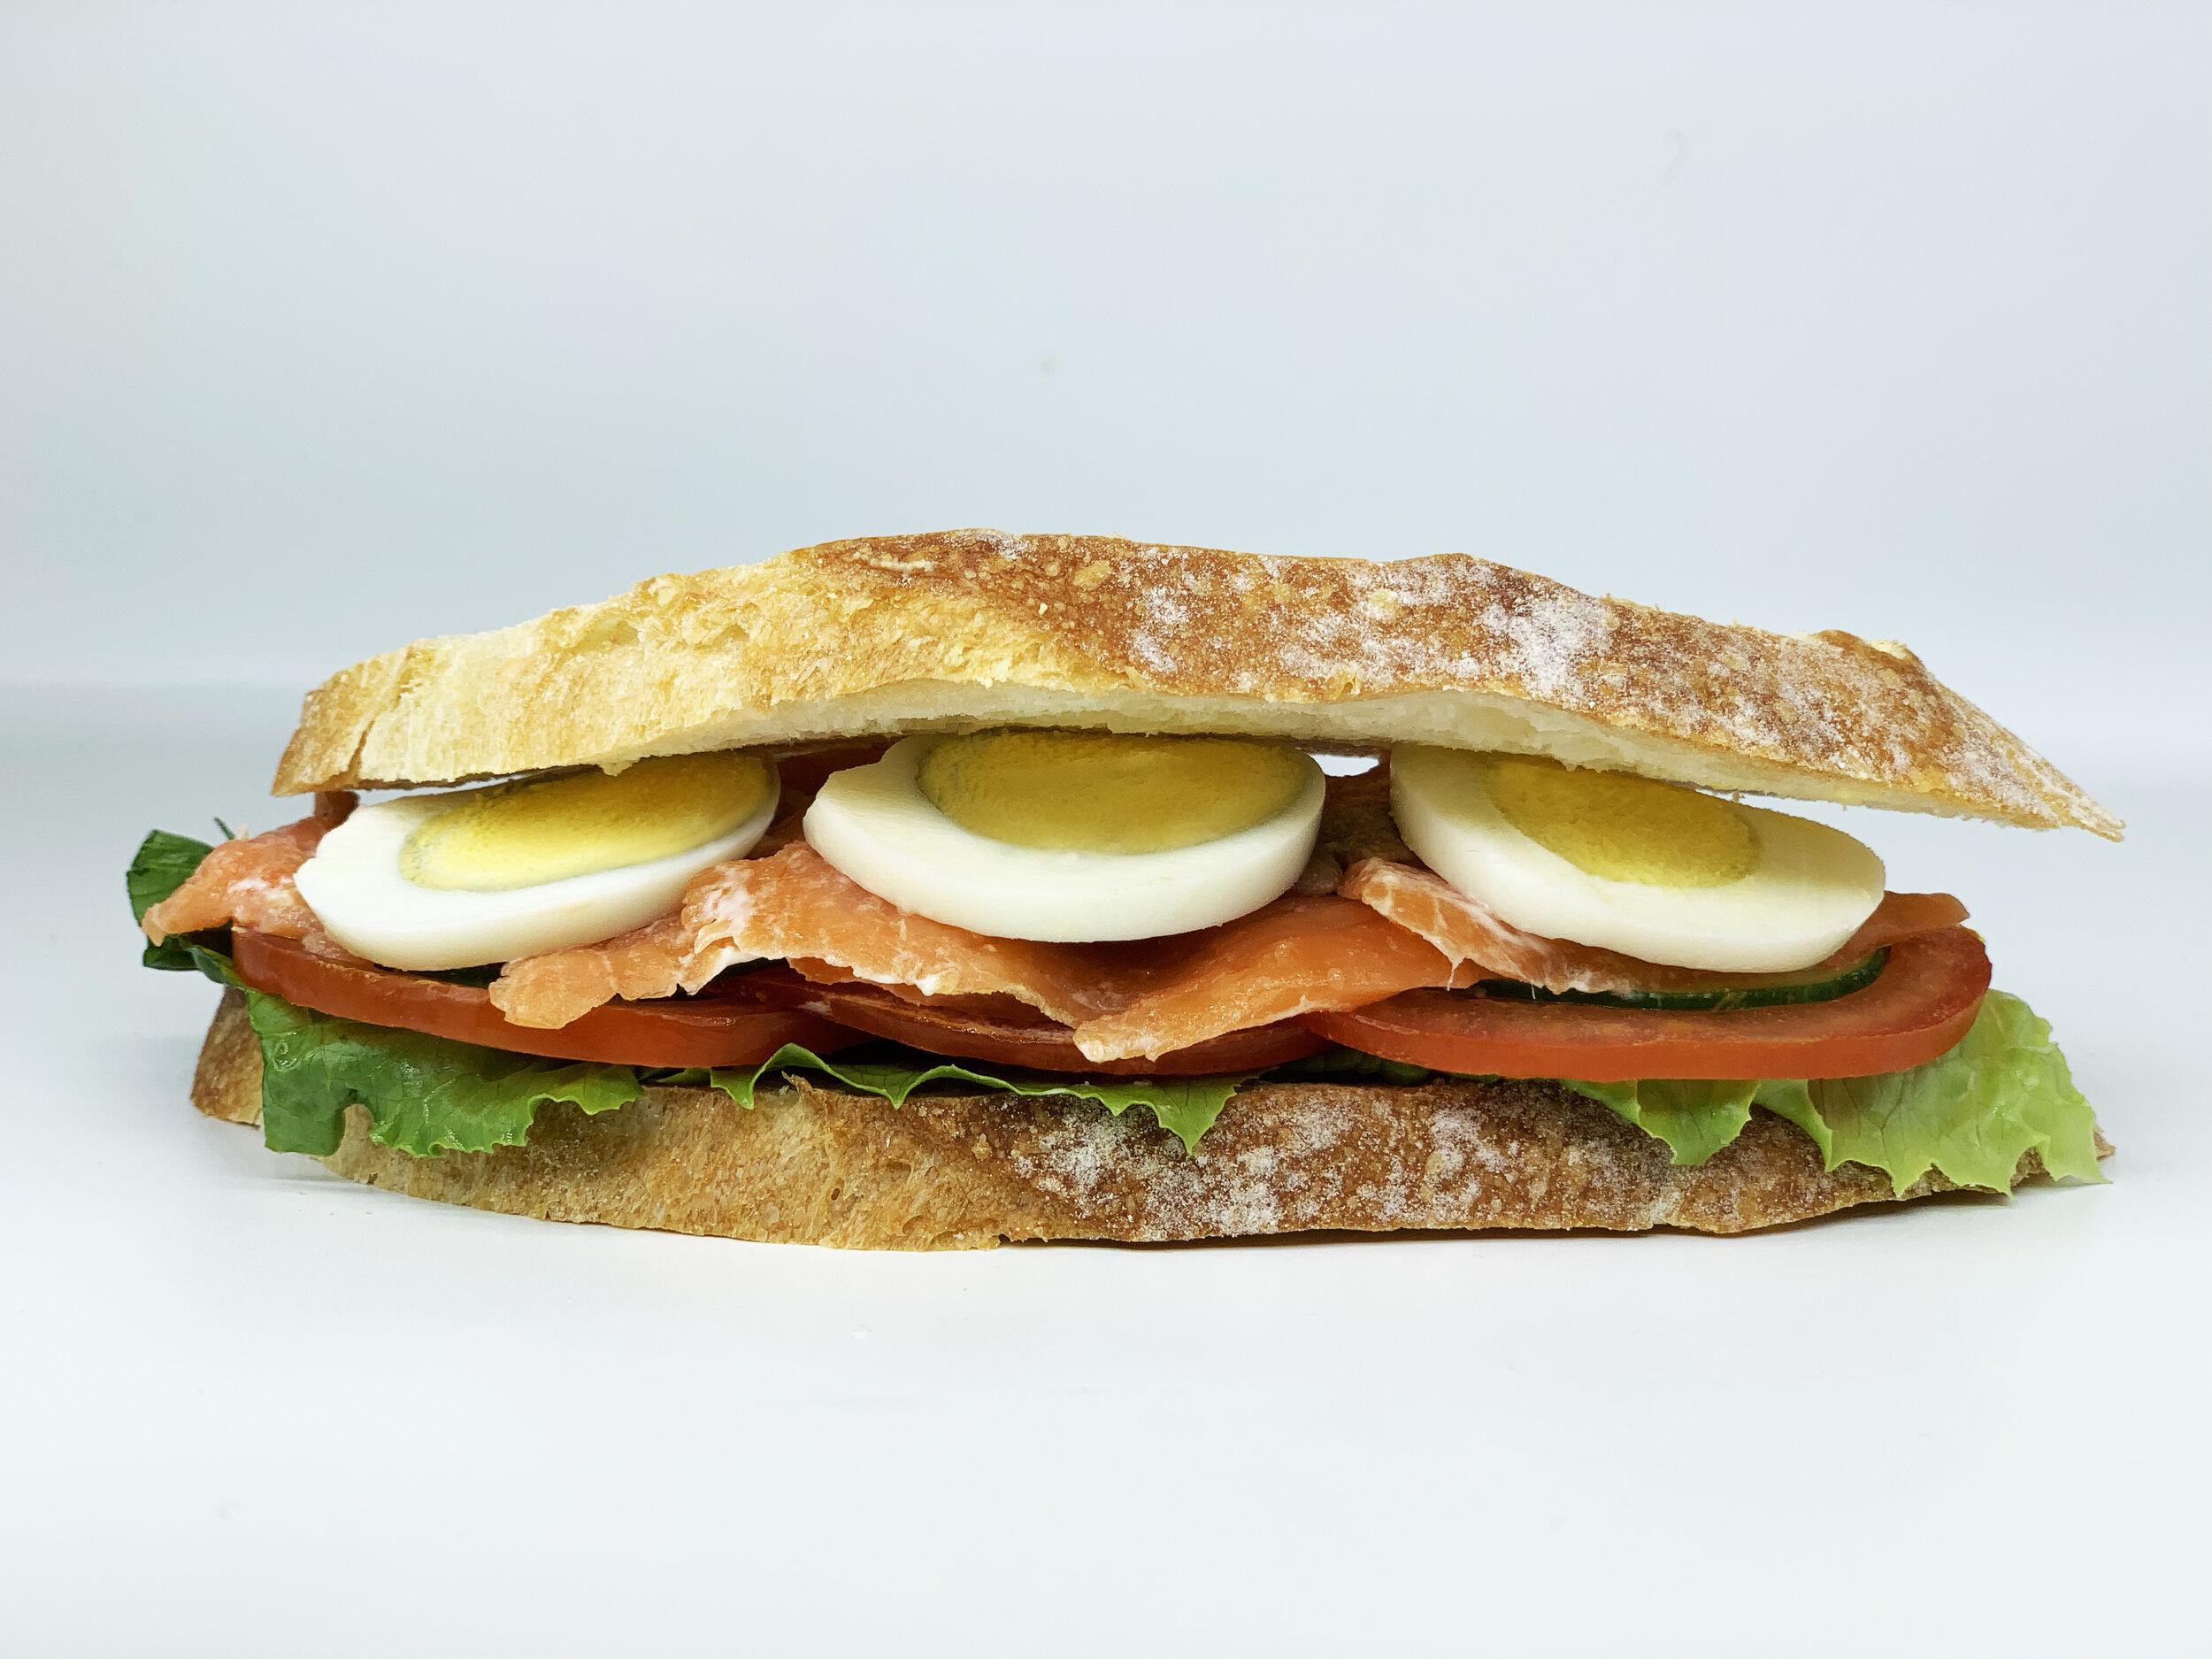 SMOKED SALMON SOURDOUGH - 416.35 KCAL PER SERVINGSmoked Salmon, Tomato, Cucumber, Egg, Butter Lettuce,12 Noon Caesar Dressing, Sourdough Bread$35